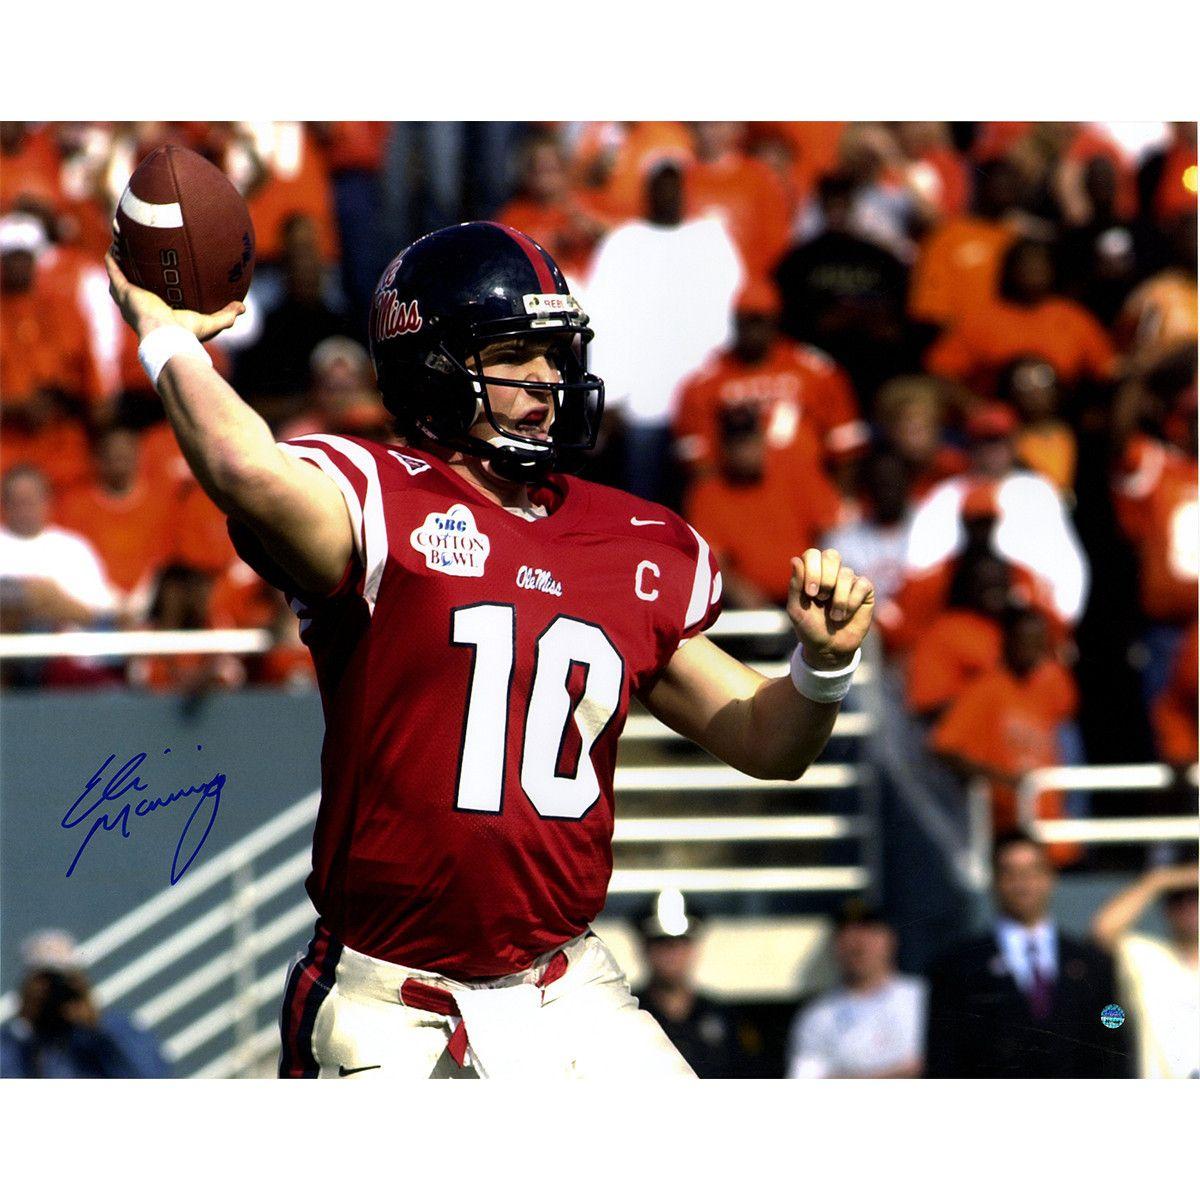 Eli Manning Signed Ole Miss Red Jersey 16x20 Photo Steiner